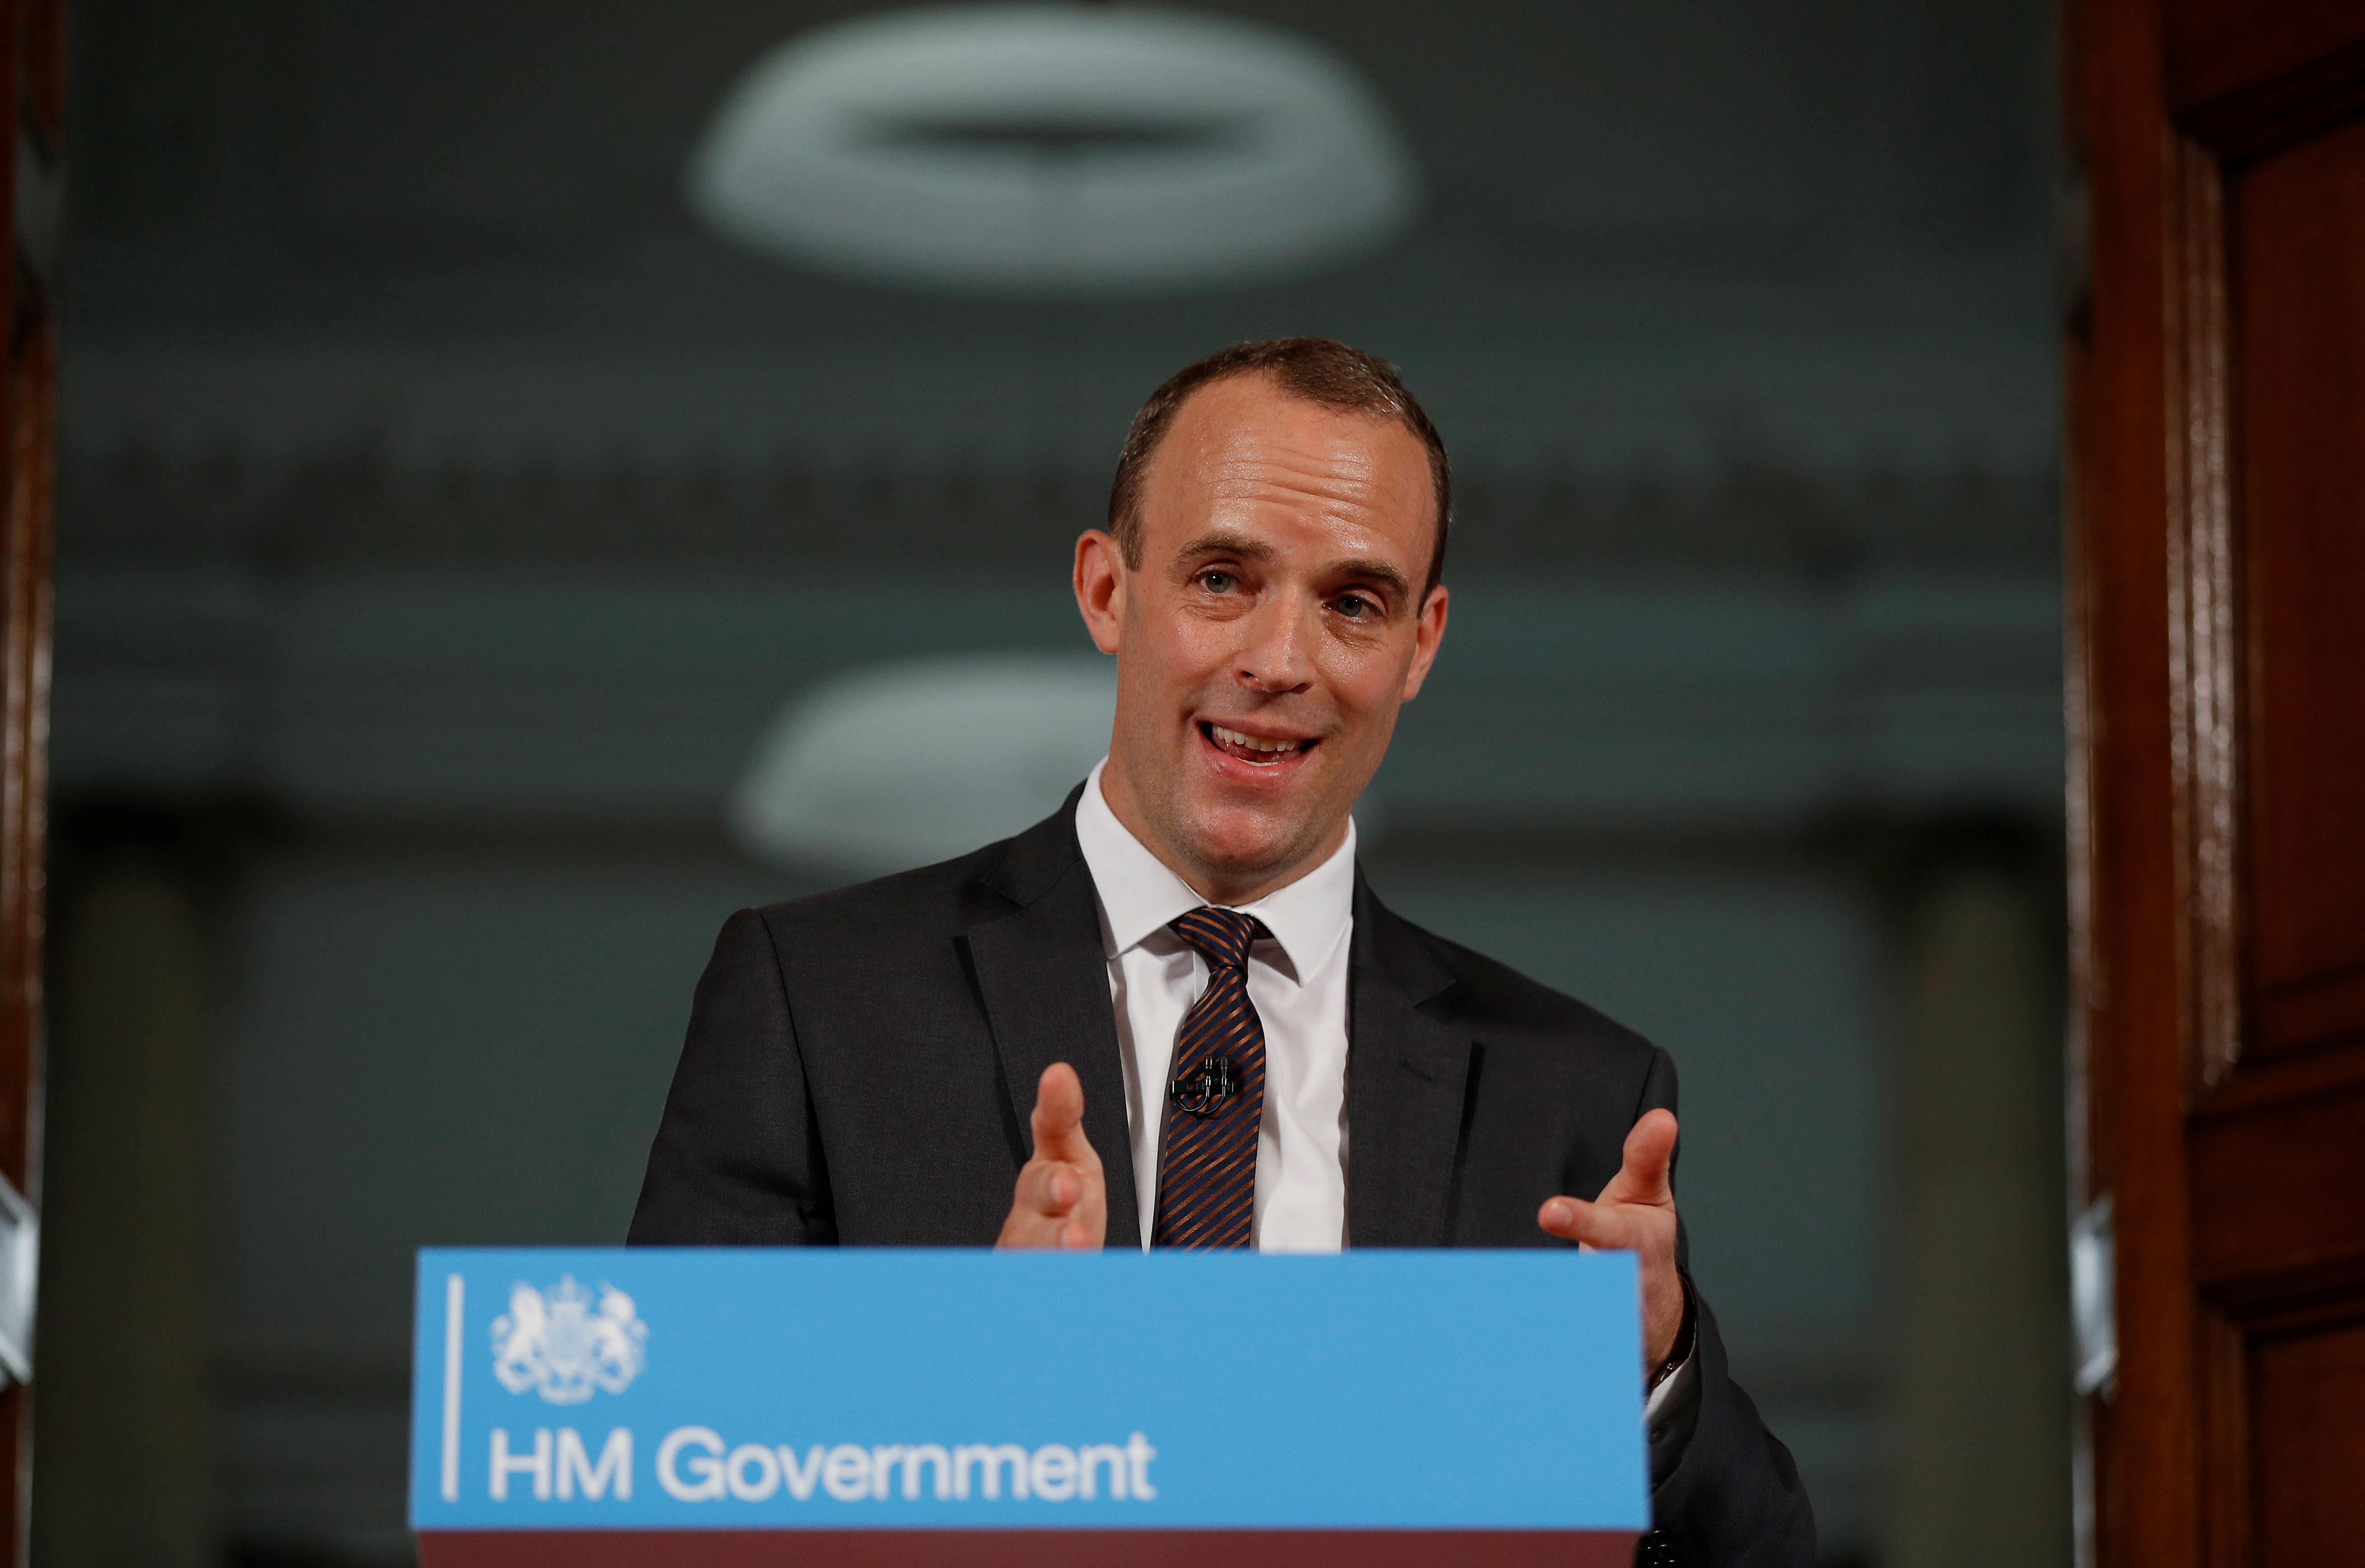 Brexit Secretary Dominic Raab